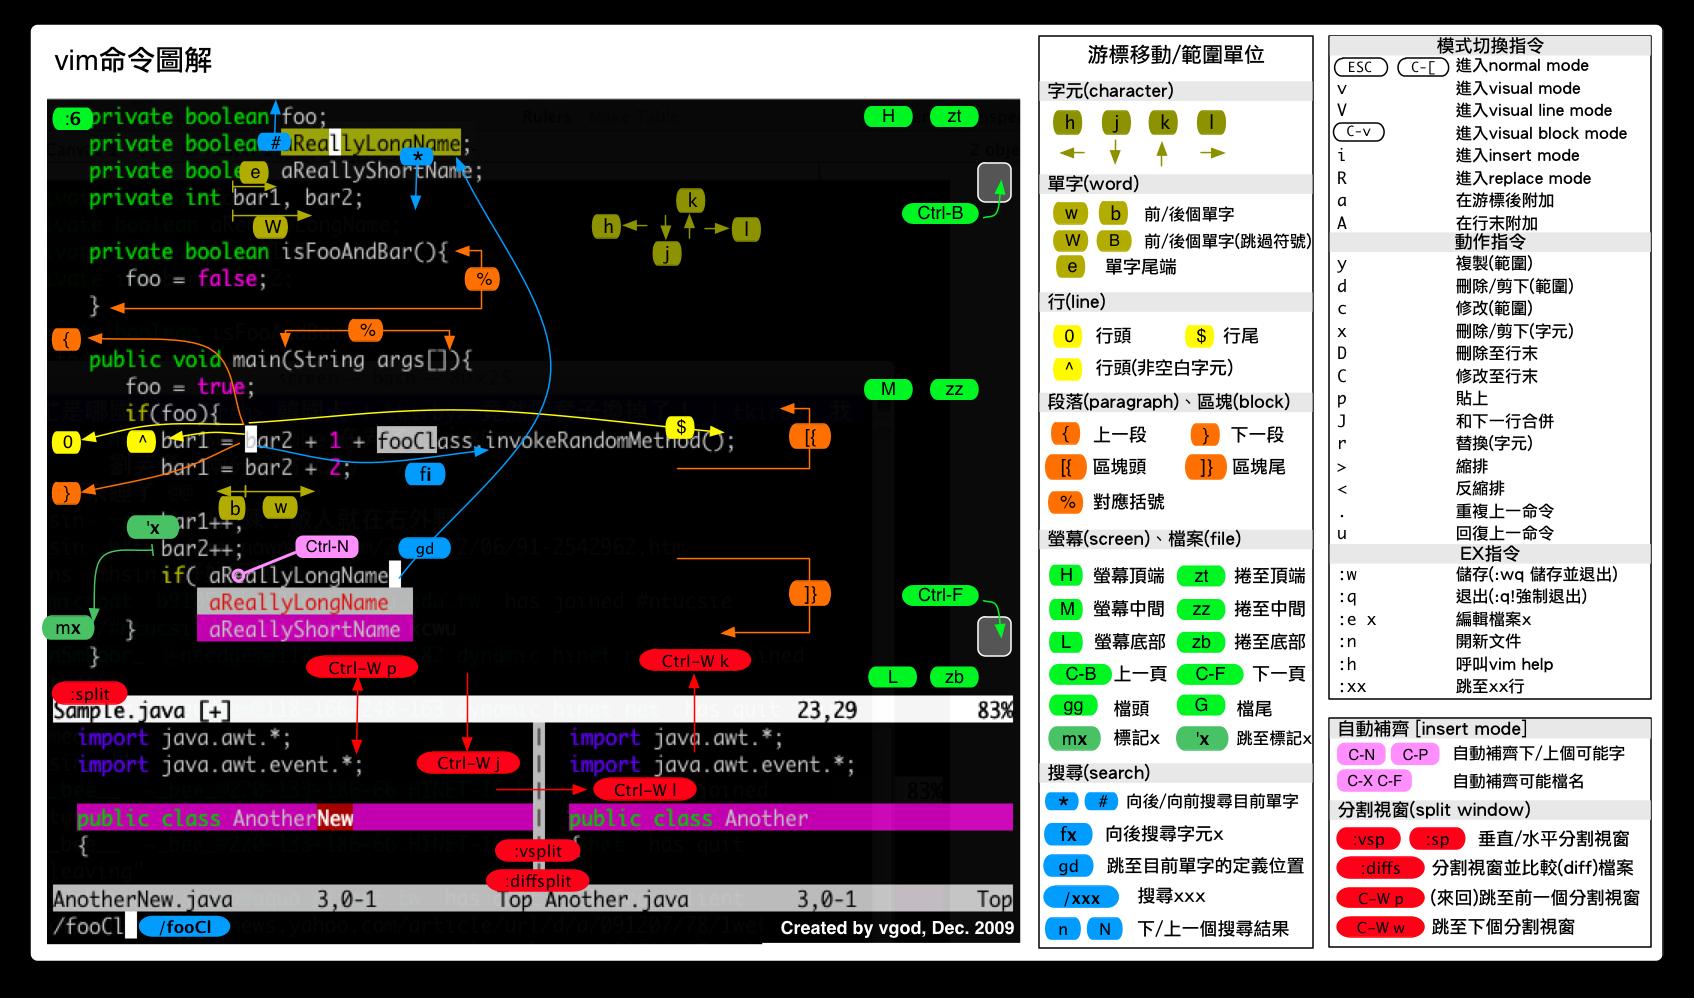 20180517_vim命令图解.png